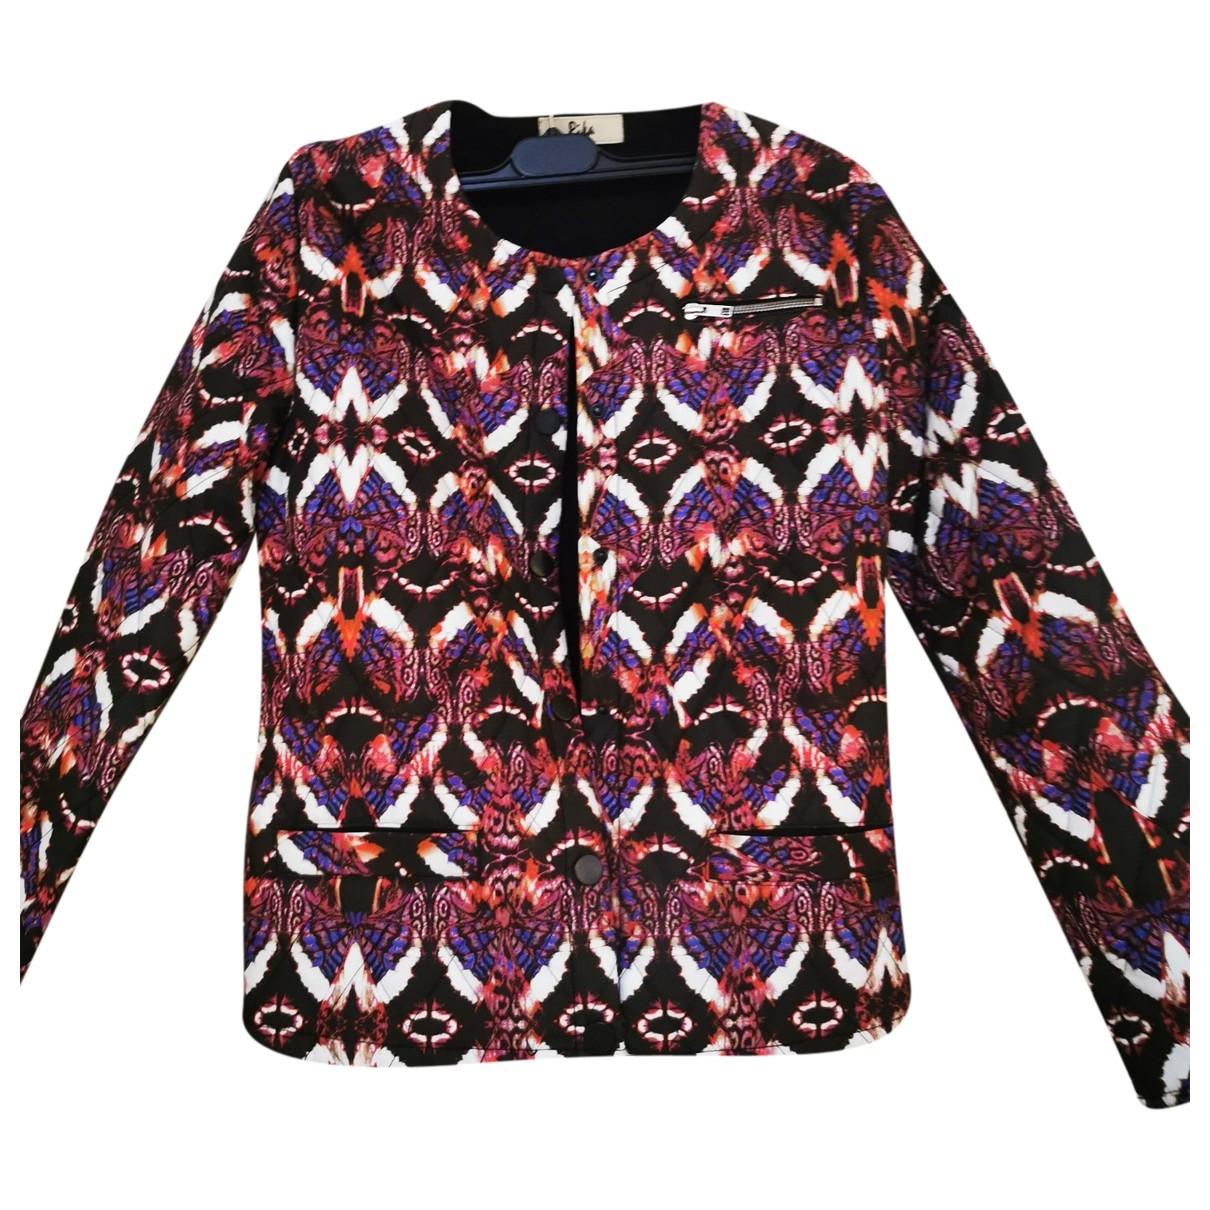 Rika \N Cotton jacket for Women S International